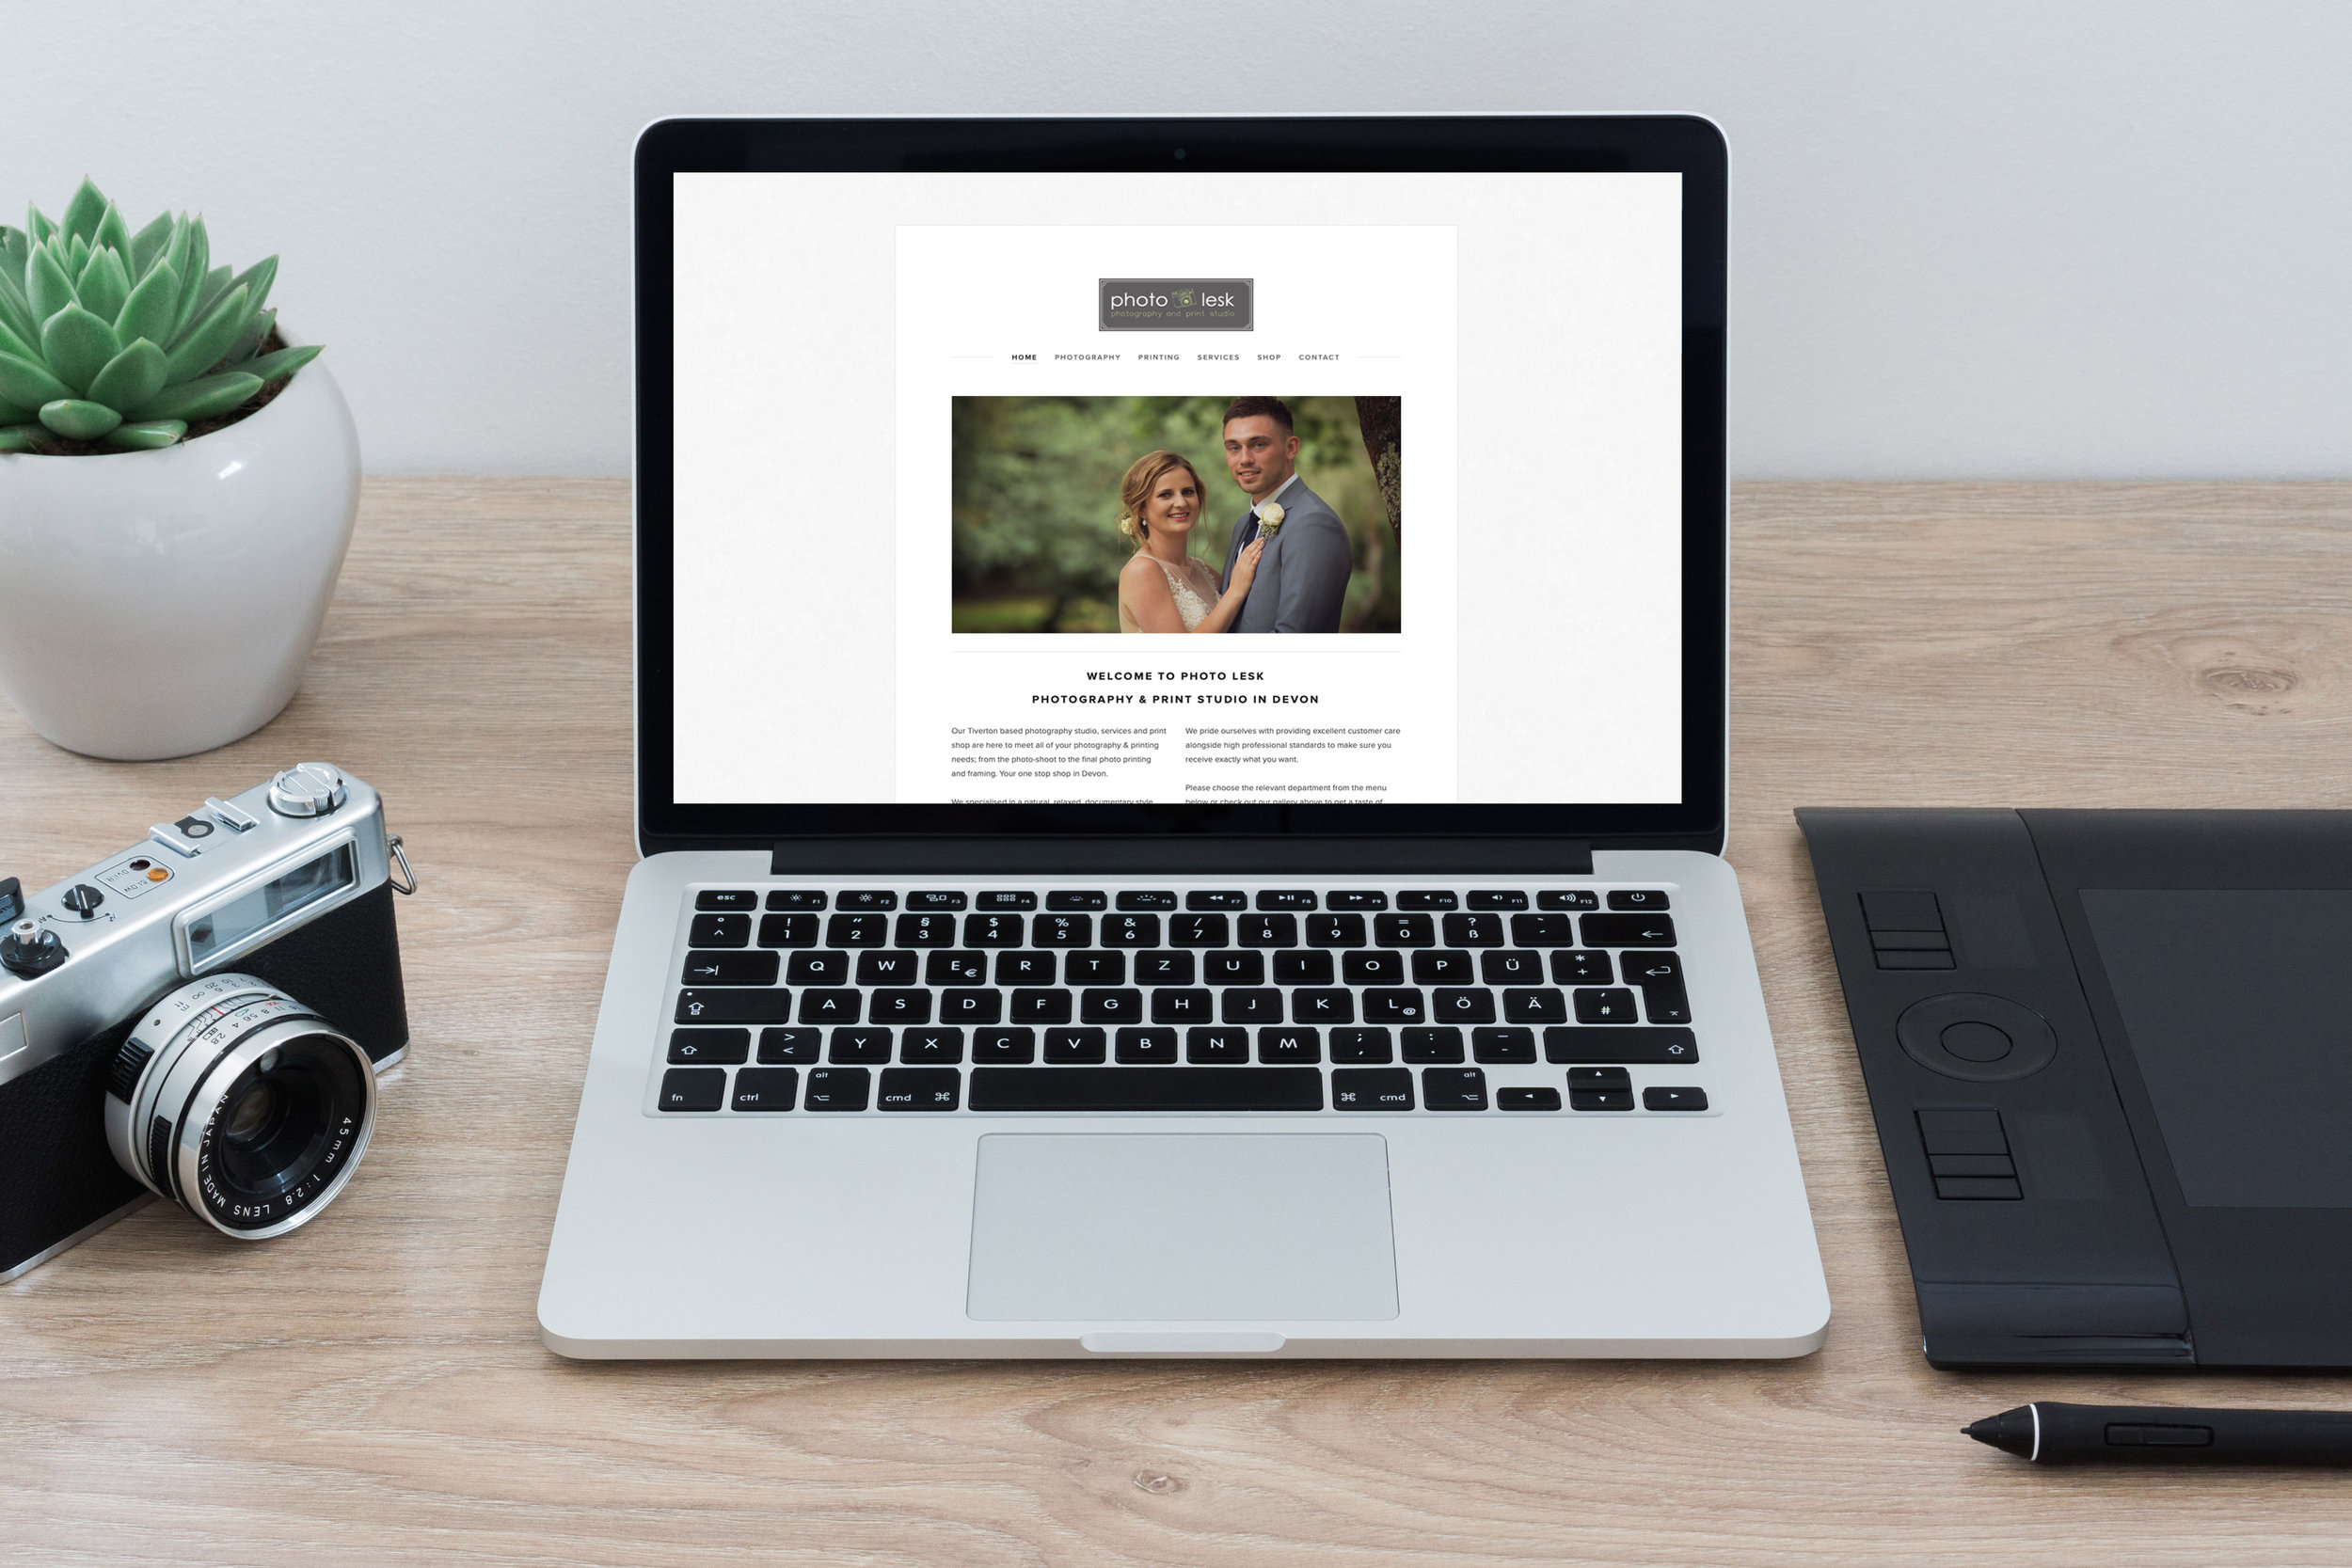 build-and-design-website.jpg